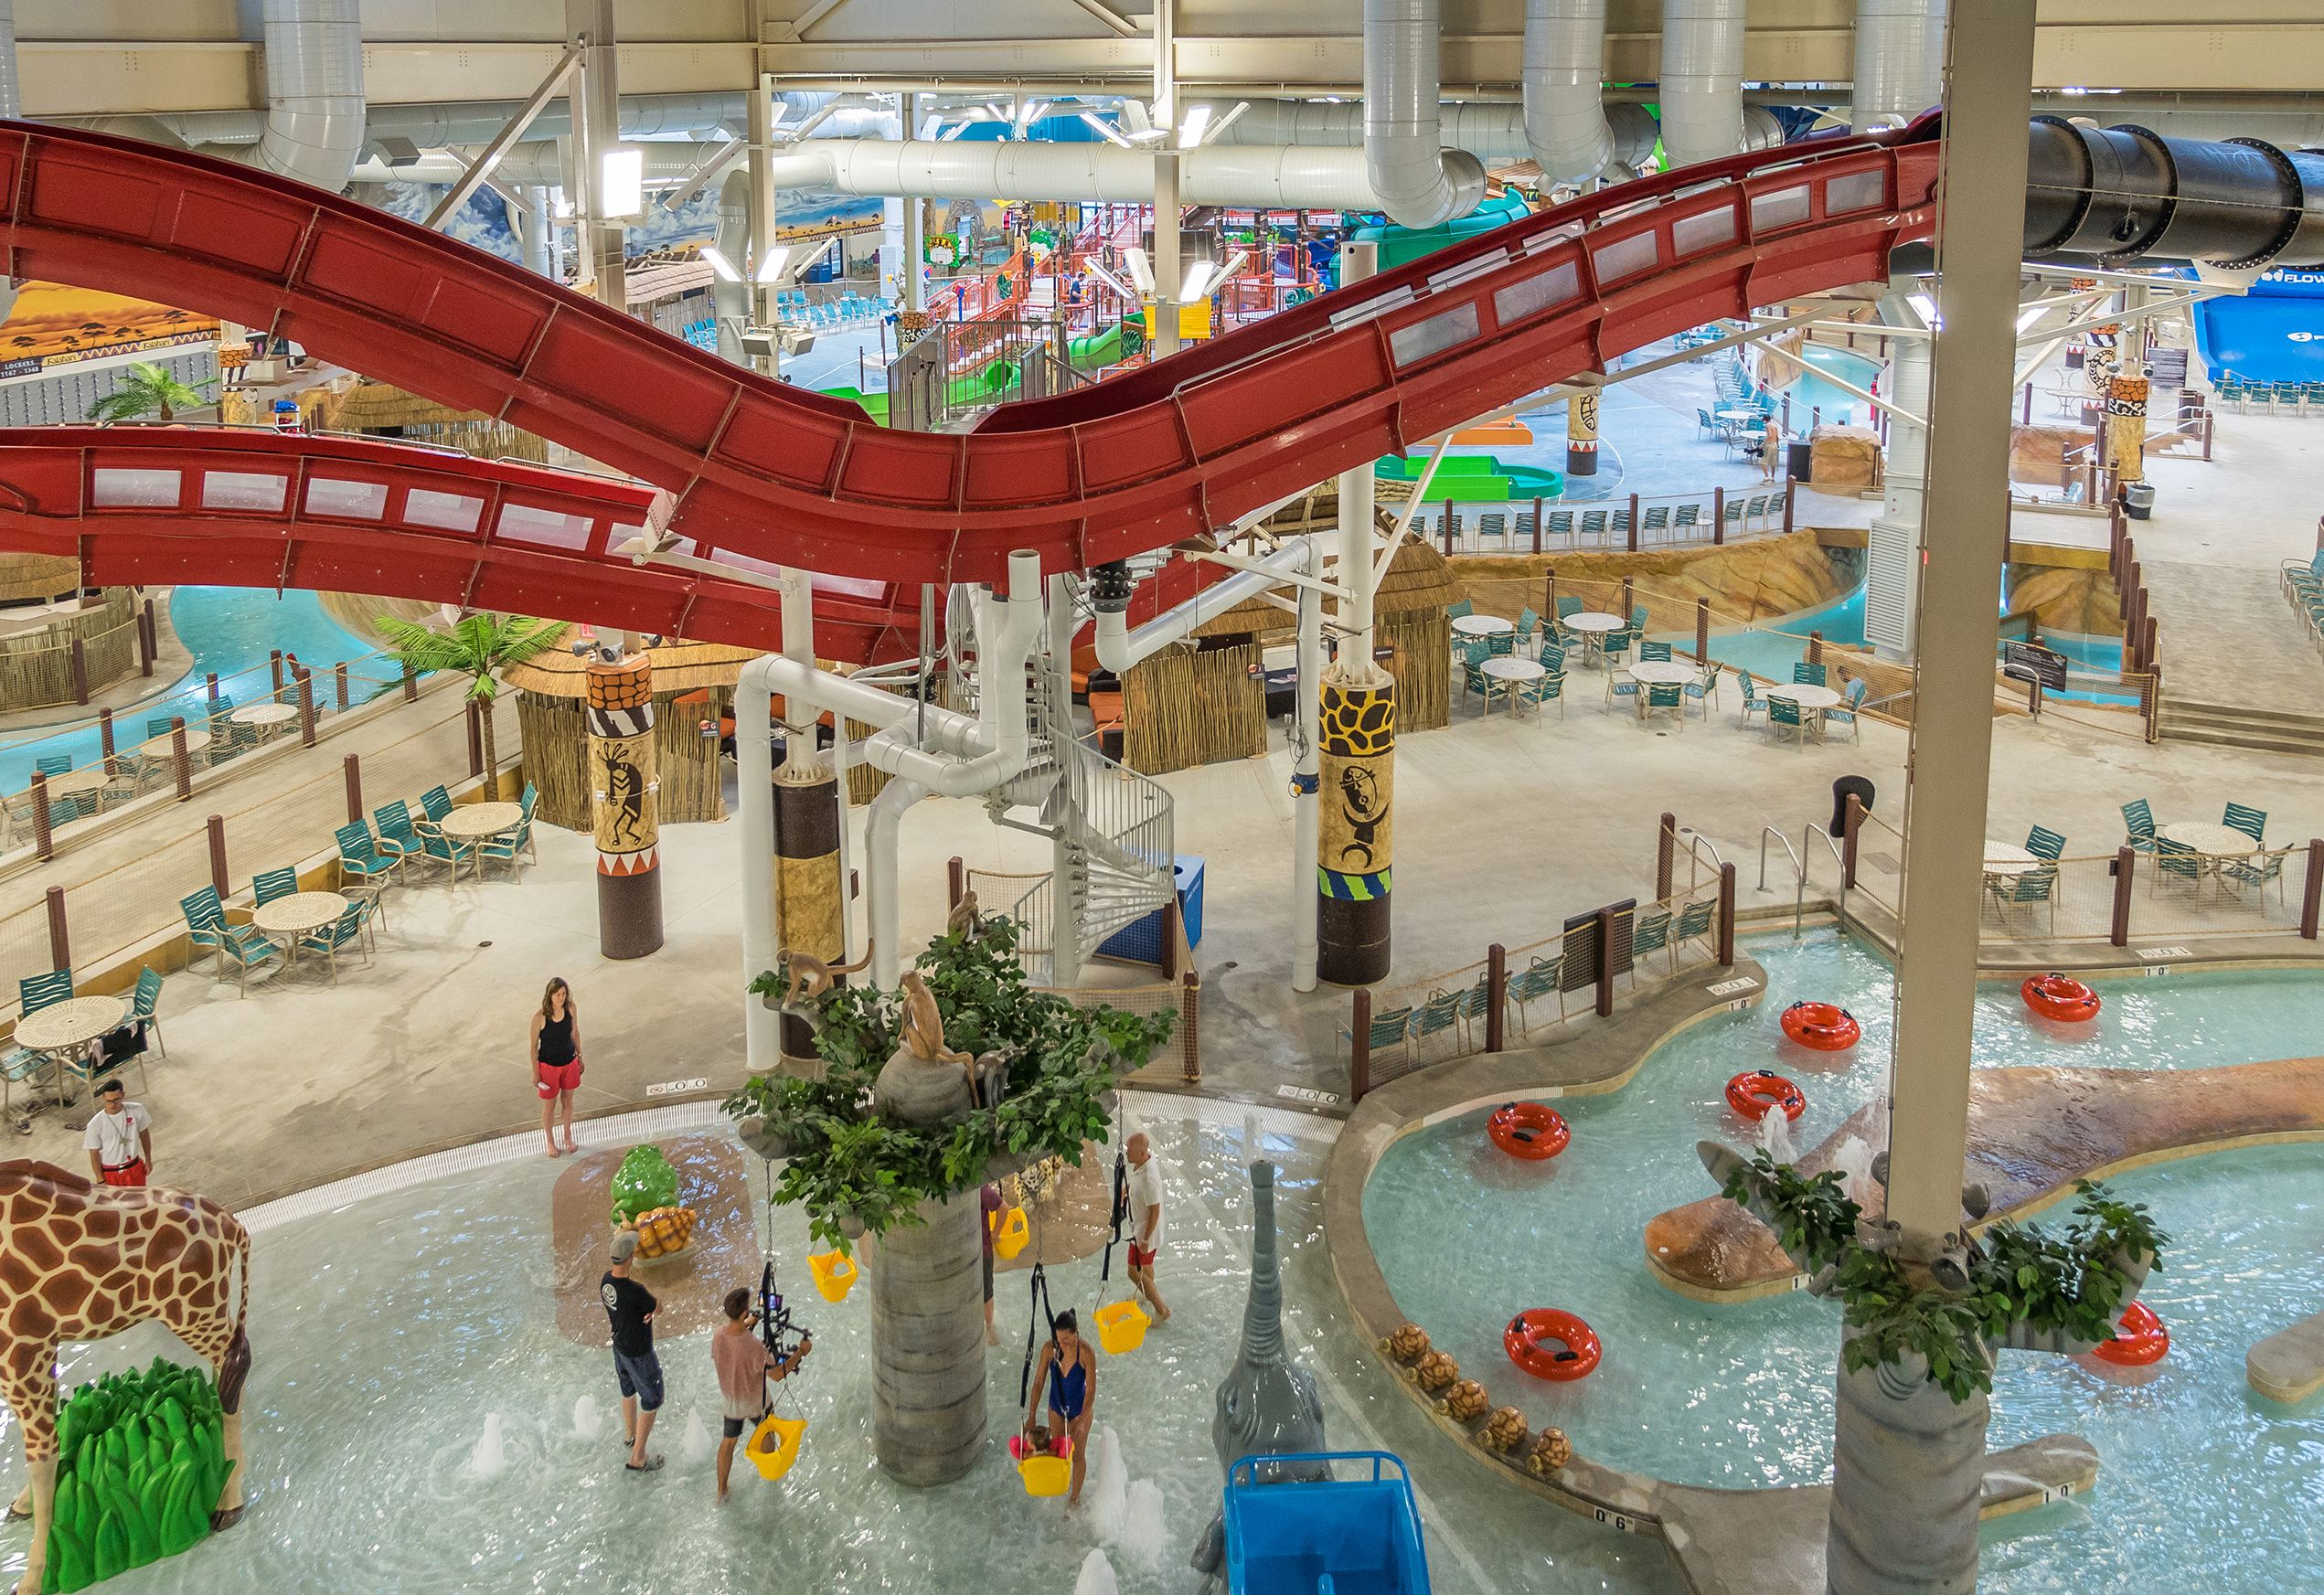 America's Best Indoor Water Parks in Every Region